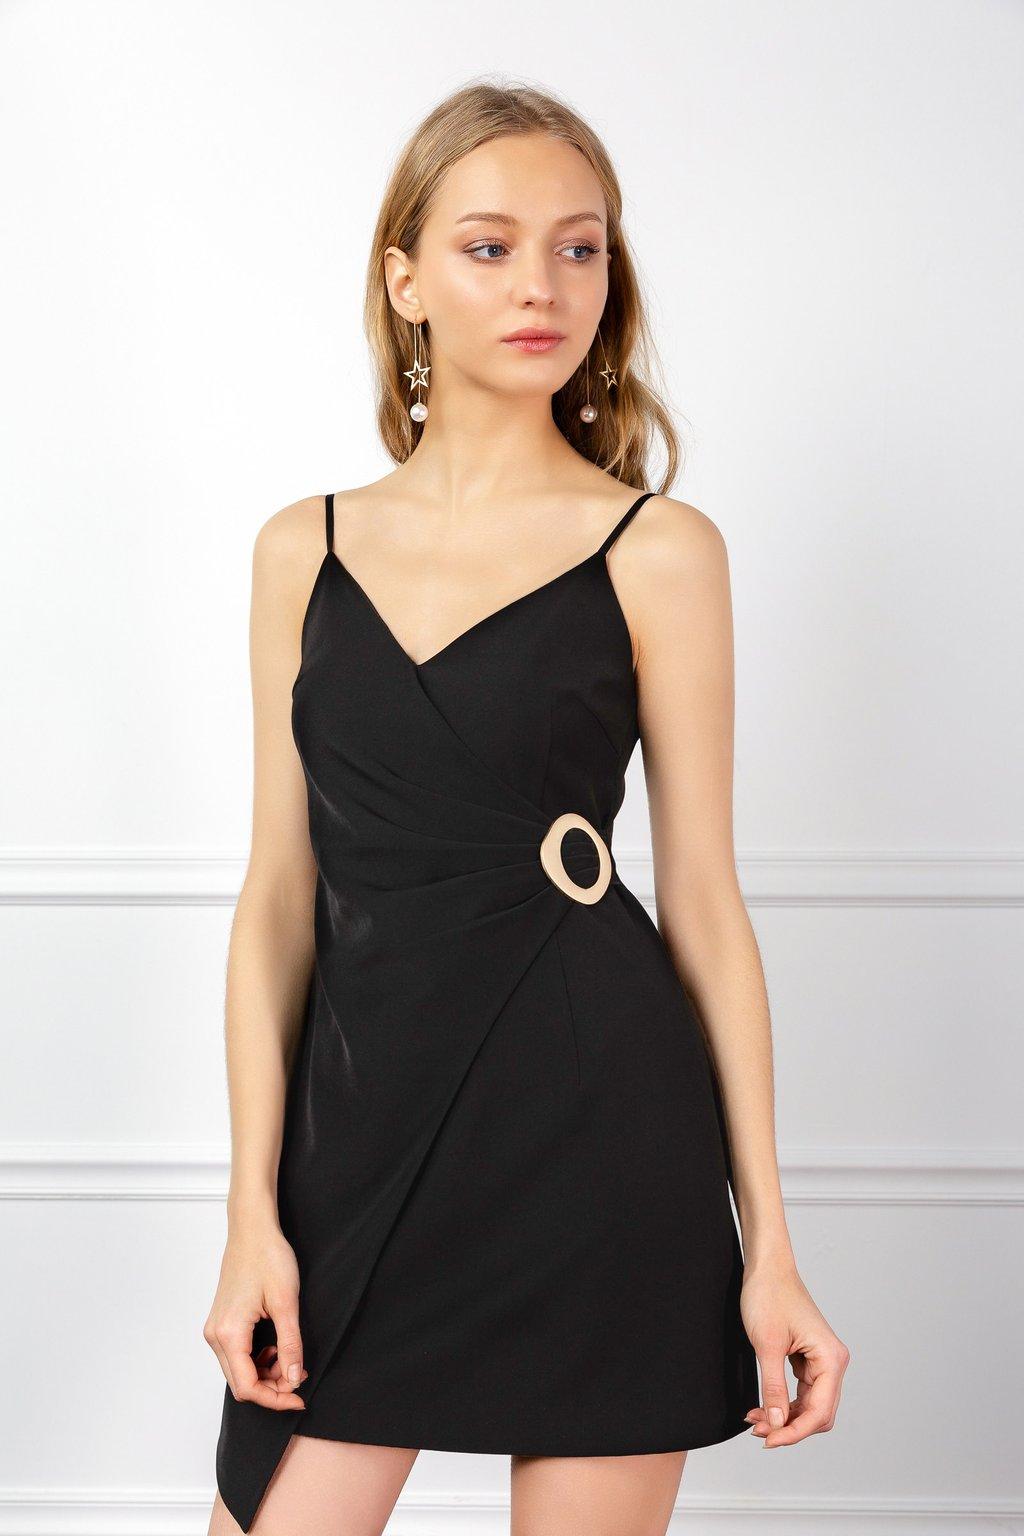 Little Black Dress by J.ING women's fashion clothing